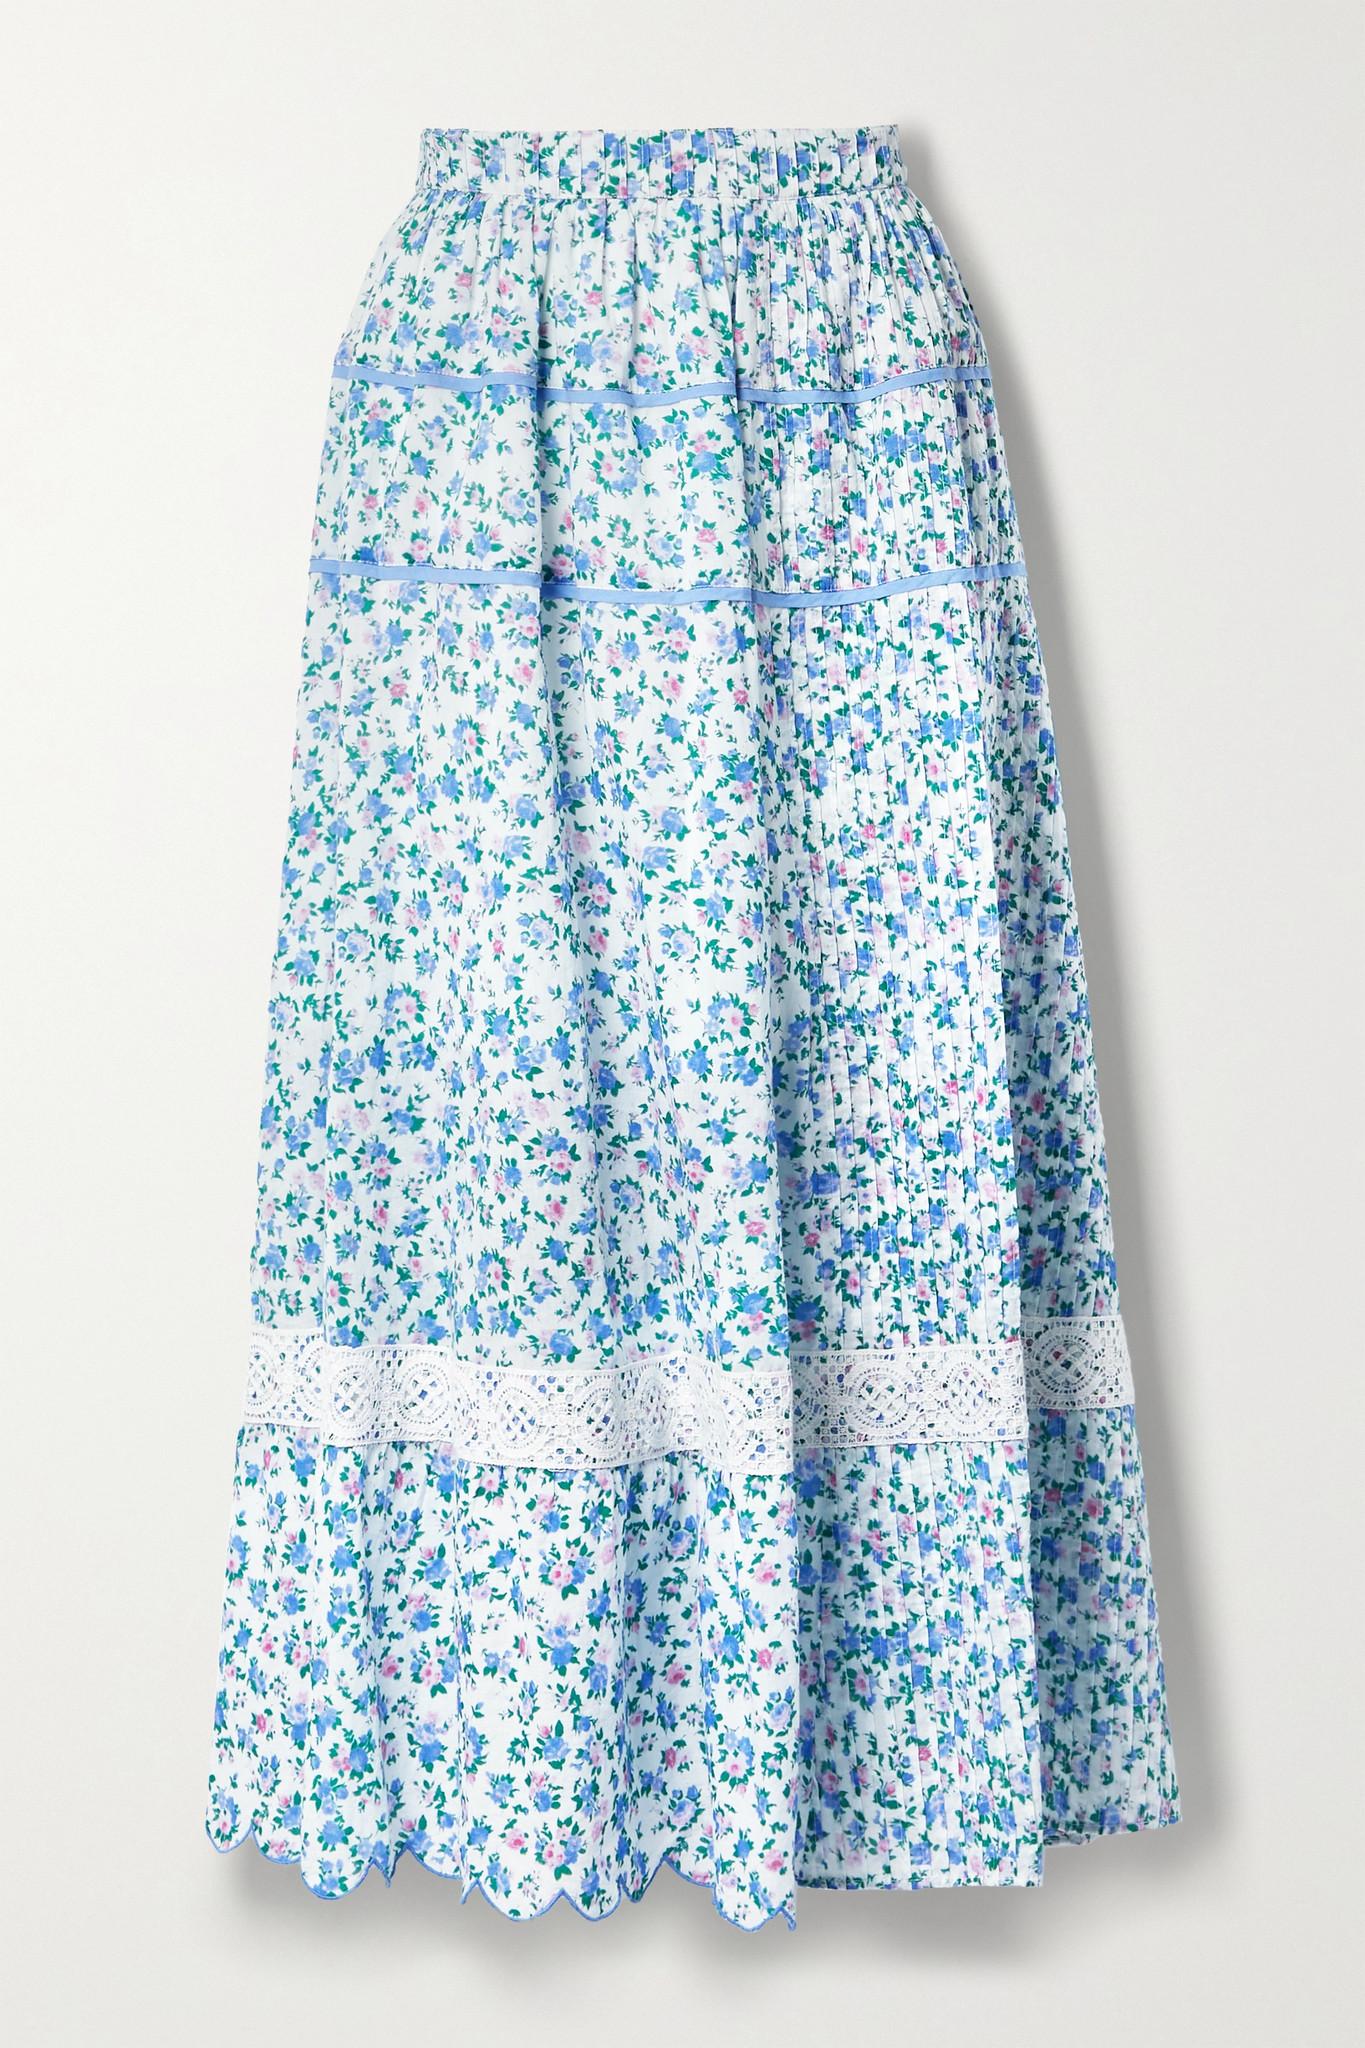 LOVESHACKFANCY - Saratoga Crochet-trimmed Scalloped Floral-print Cotton-voile Midi Skirt - Blue - xx